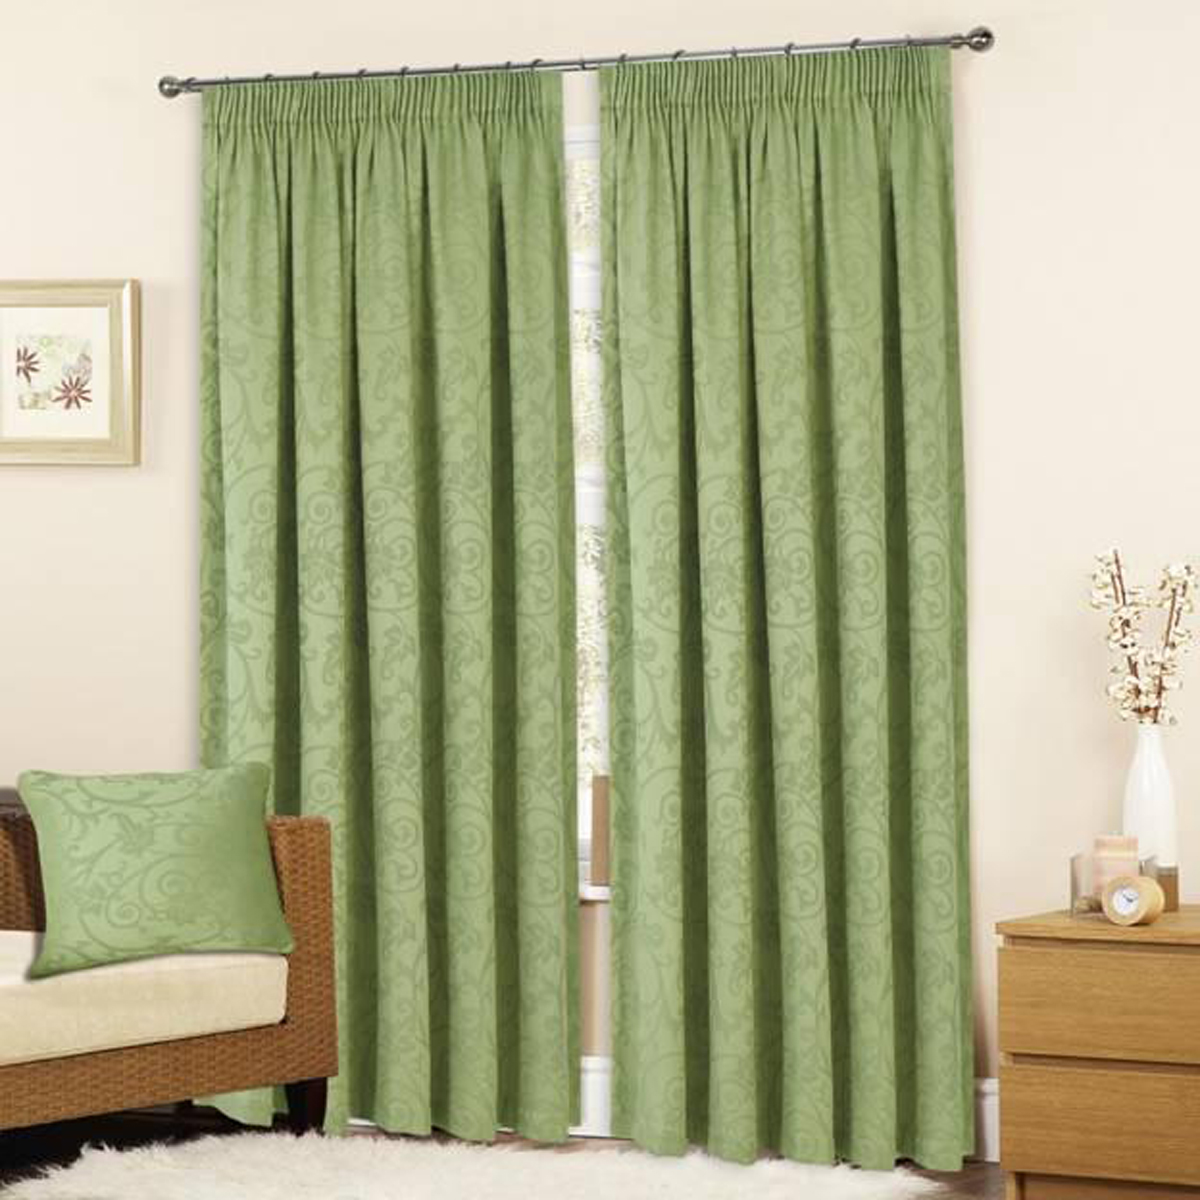 Sage Green Curtains Green Bay Window Curtains Range Of Green Bay